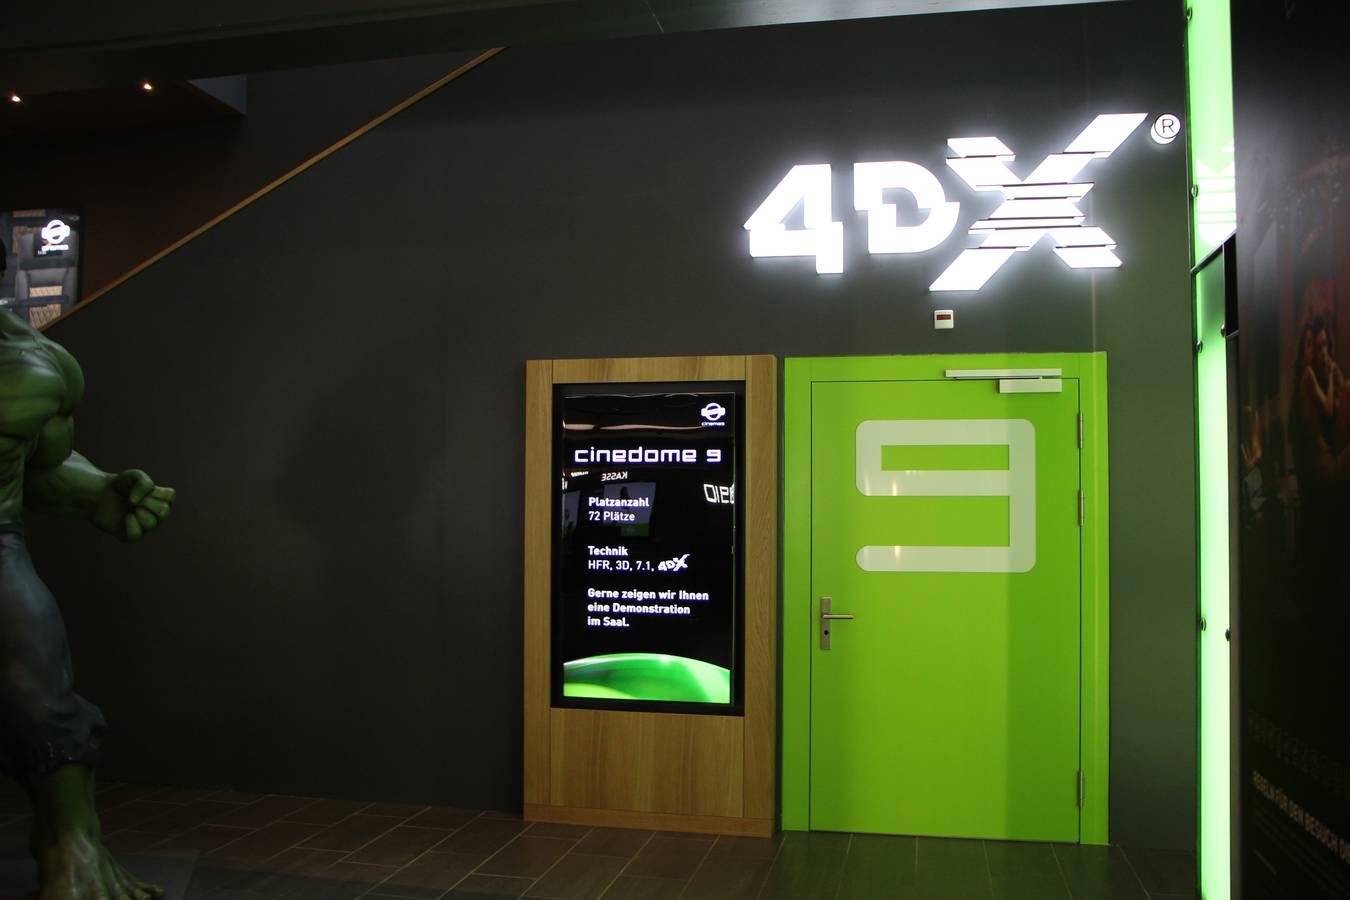 Eingang zum Kinosaal 4DX (© FM1Today)